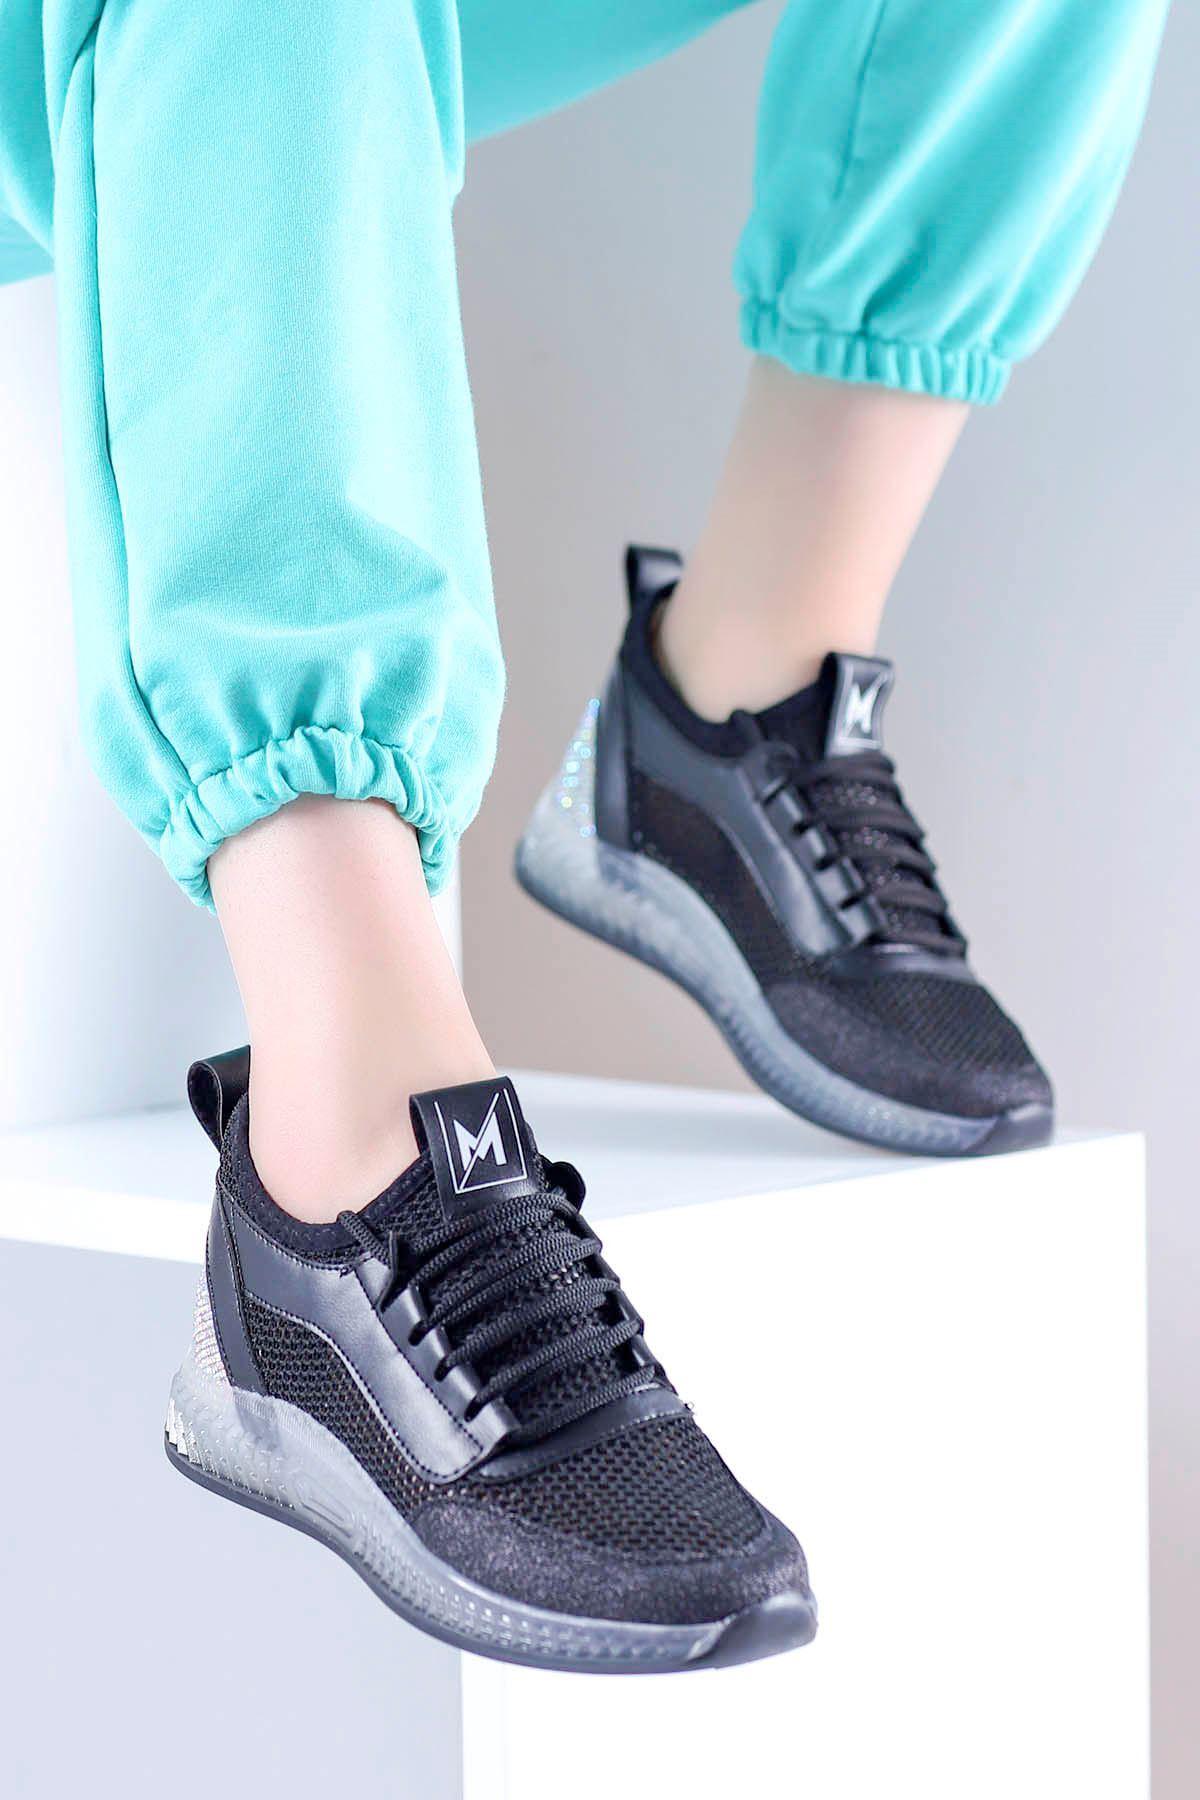 Sindirella Jel Taban Triko Spor Ayakkabı Siyah